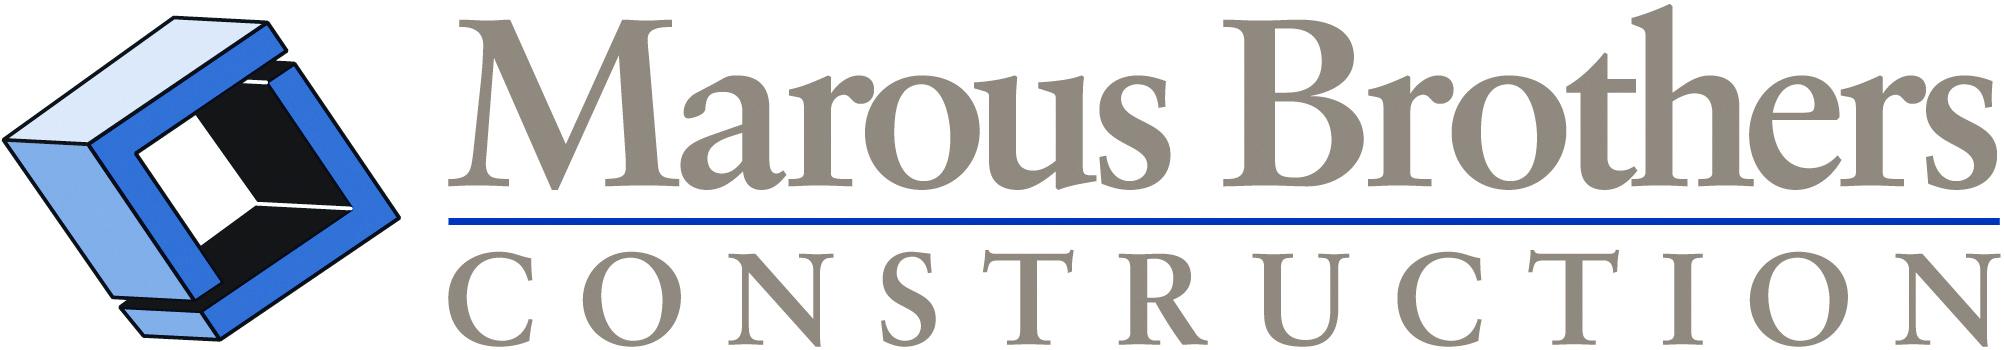 Marous Brothers logo 09.5.14